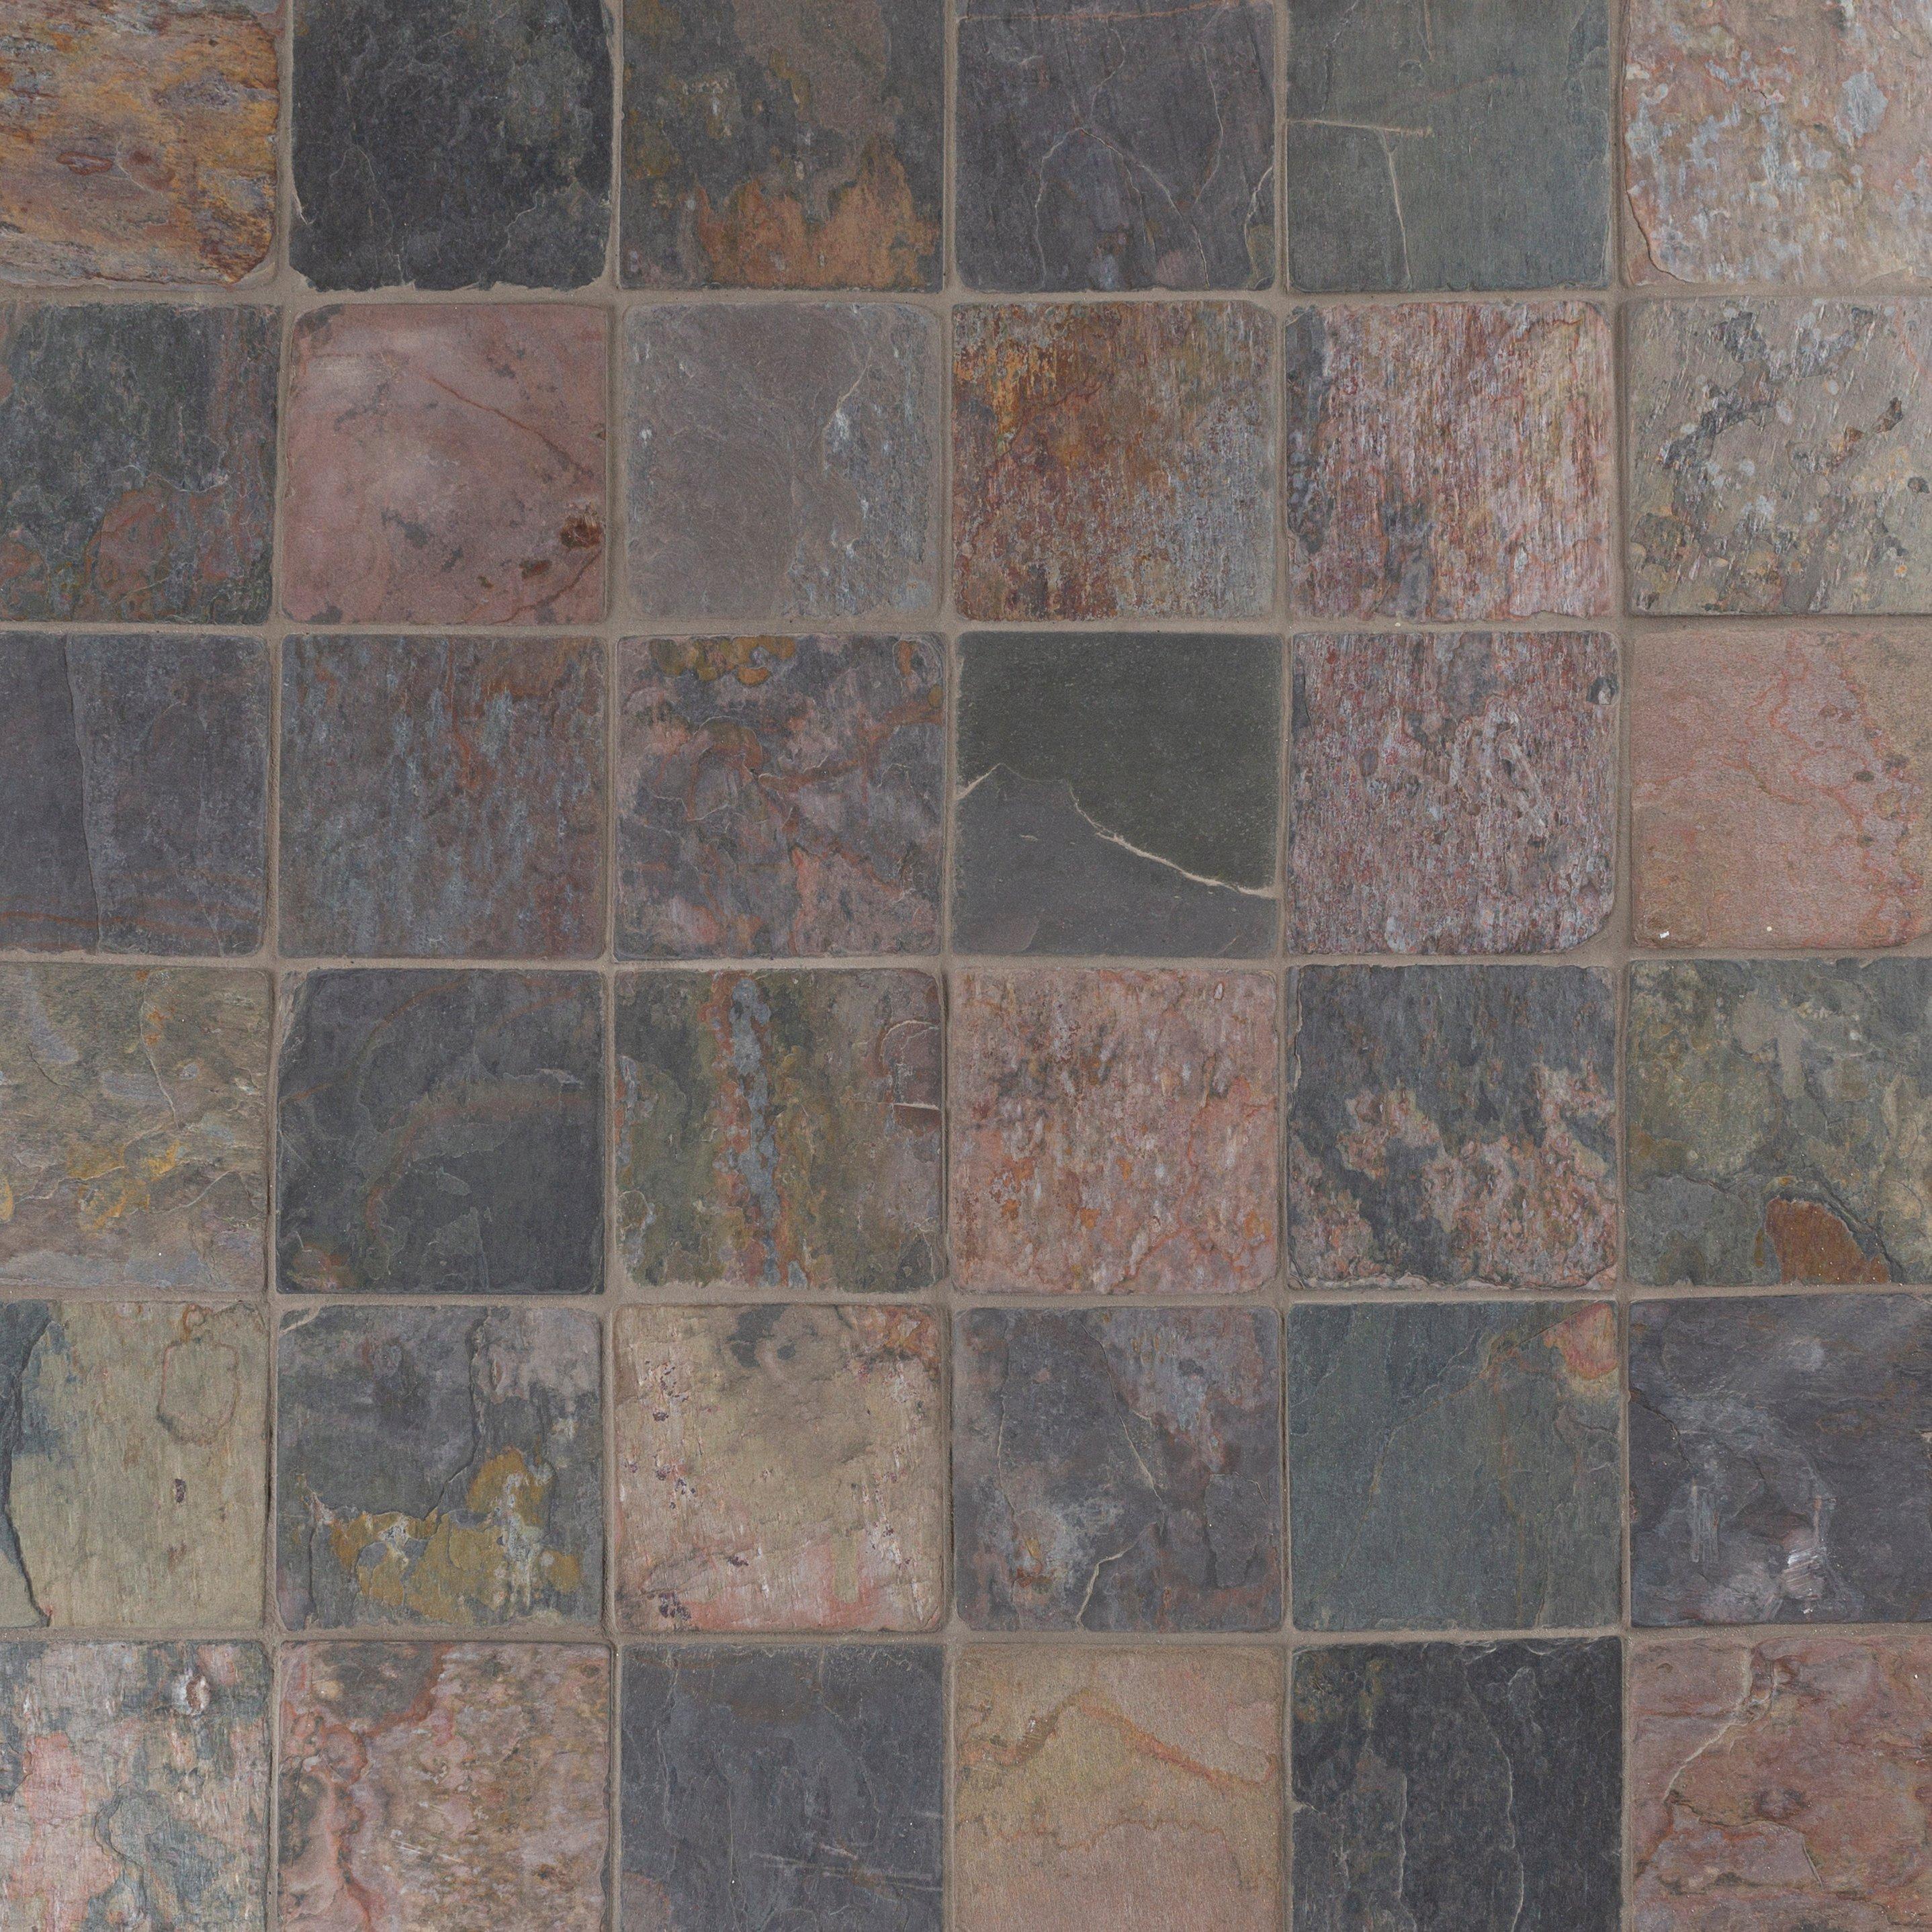 Peacock Tumbled Slate Tile 4 X 4 933100196 Floor And Decor